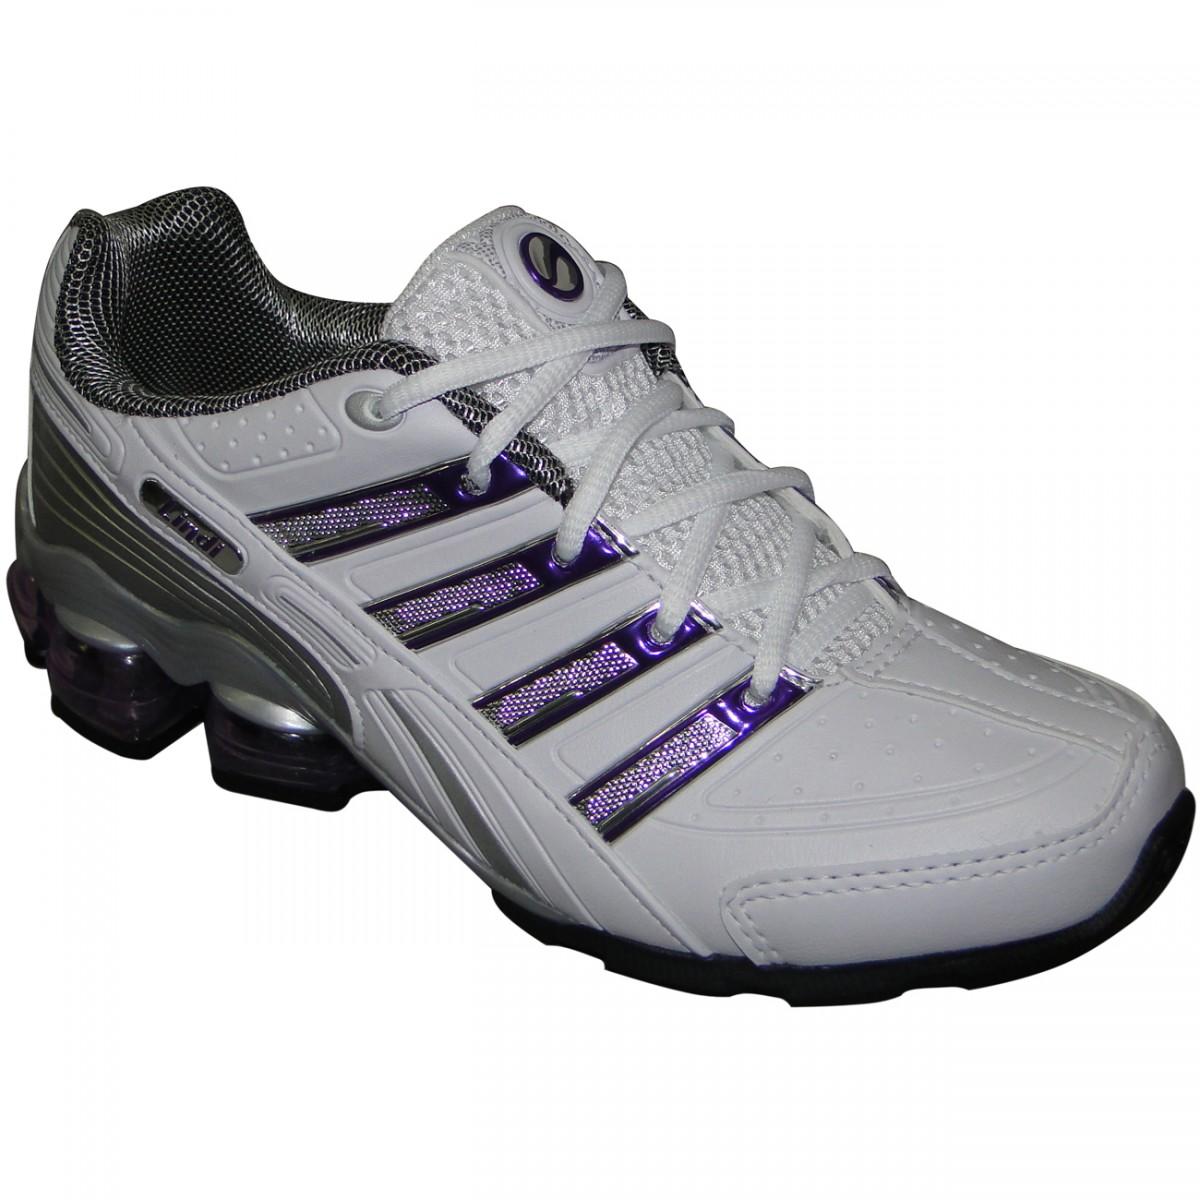 38025a71543 TENIS LINDI REF.143 8512 - BRANCO ROXO - Chuteira Nike